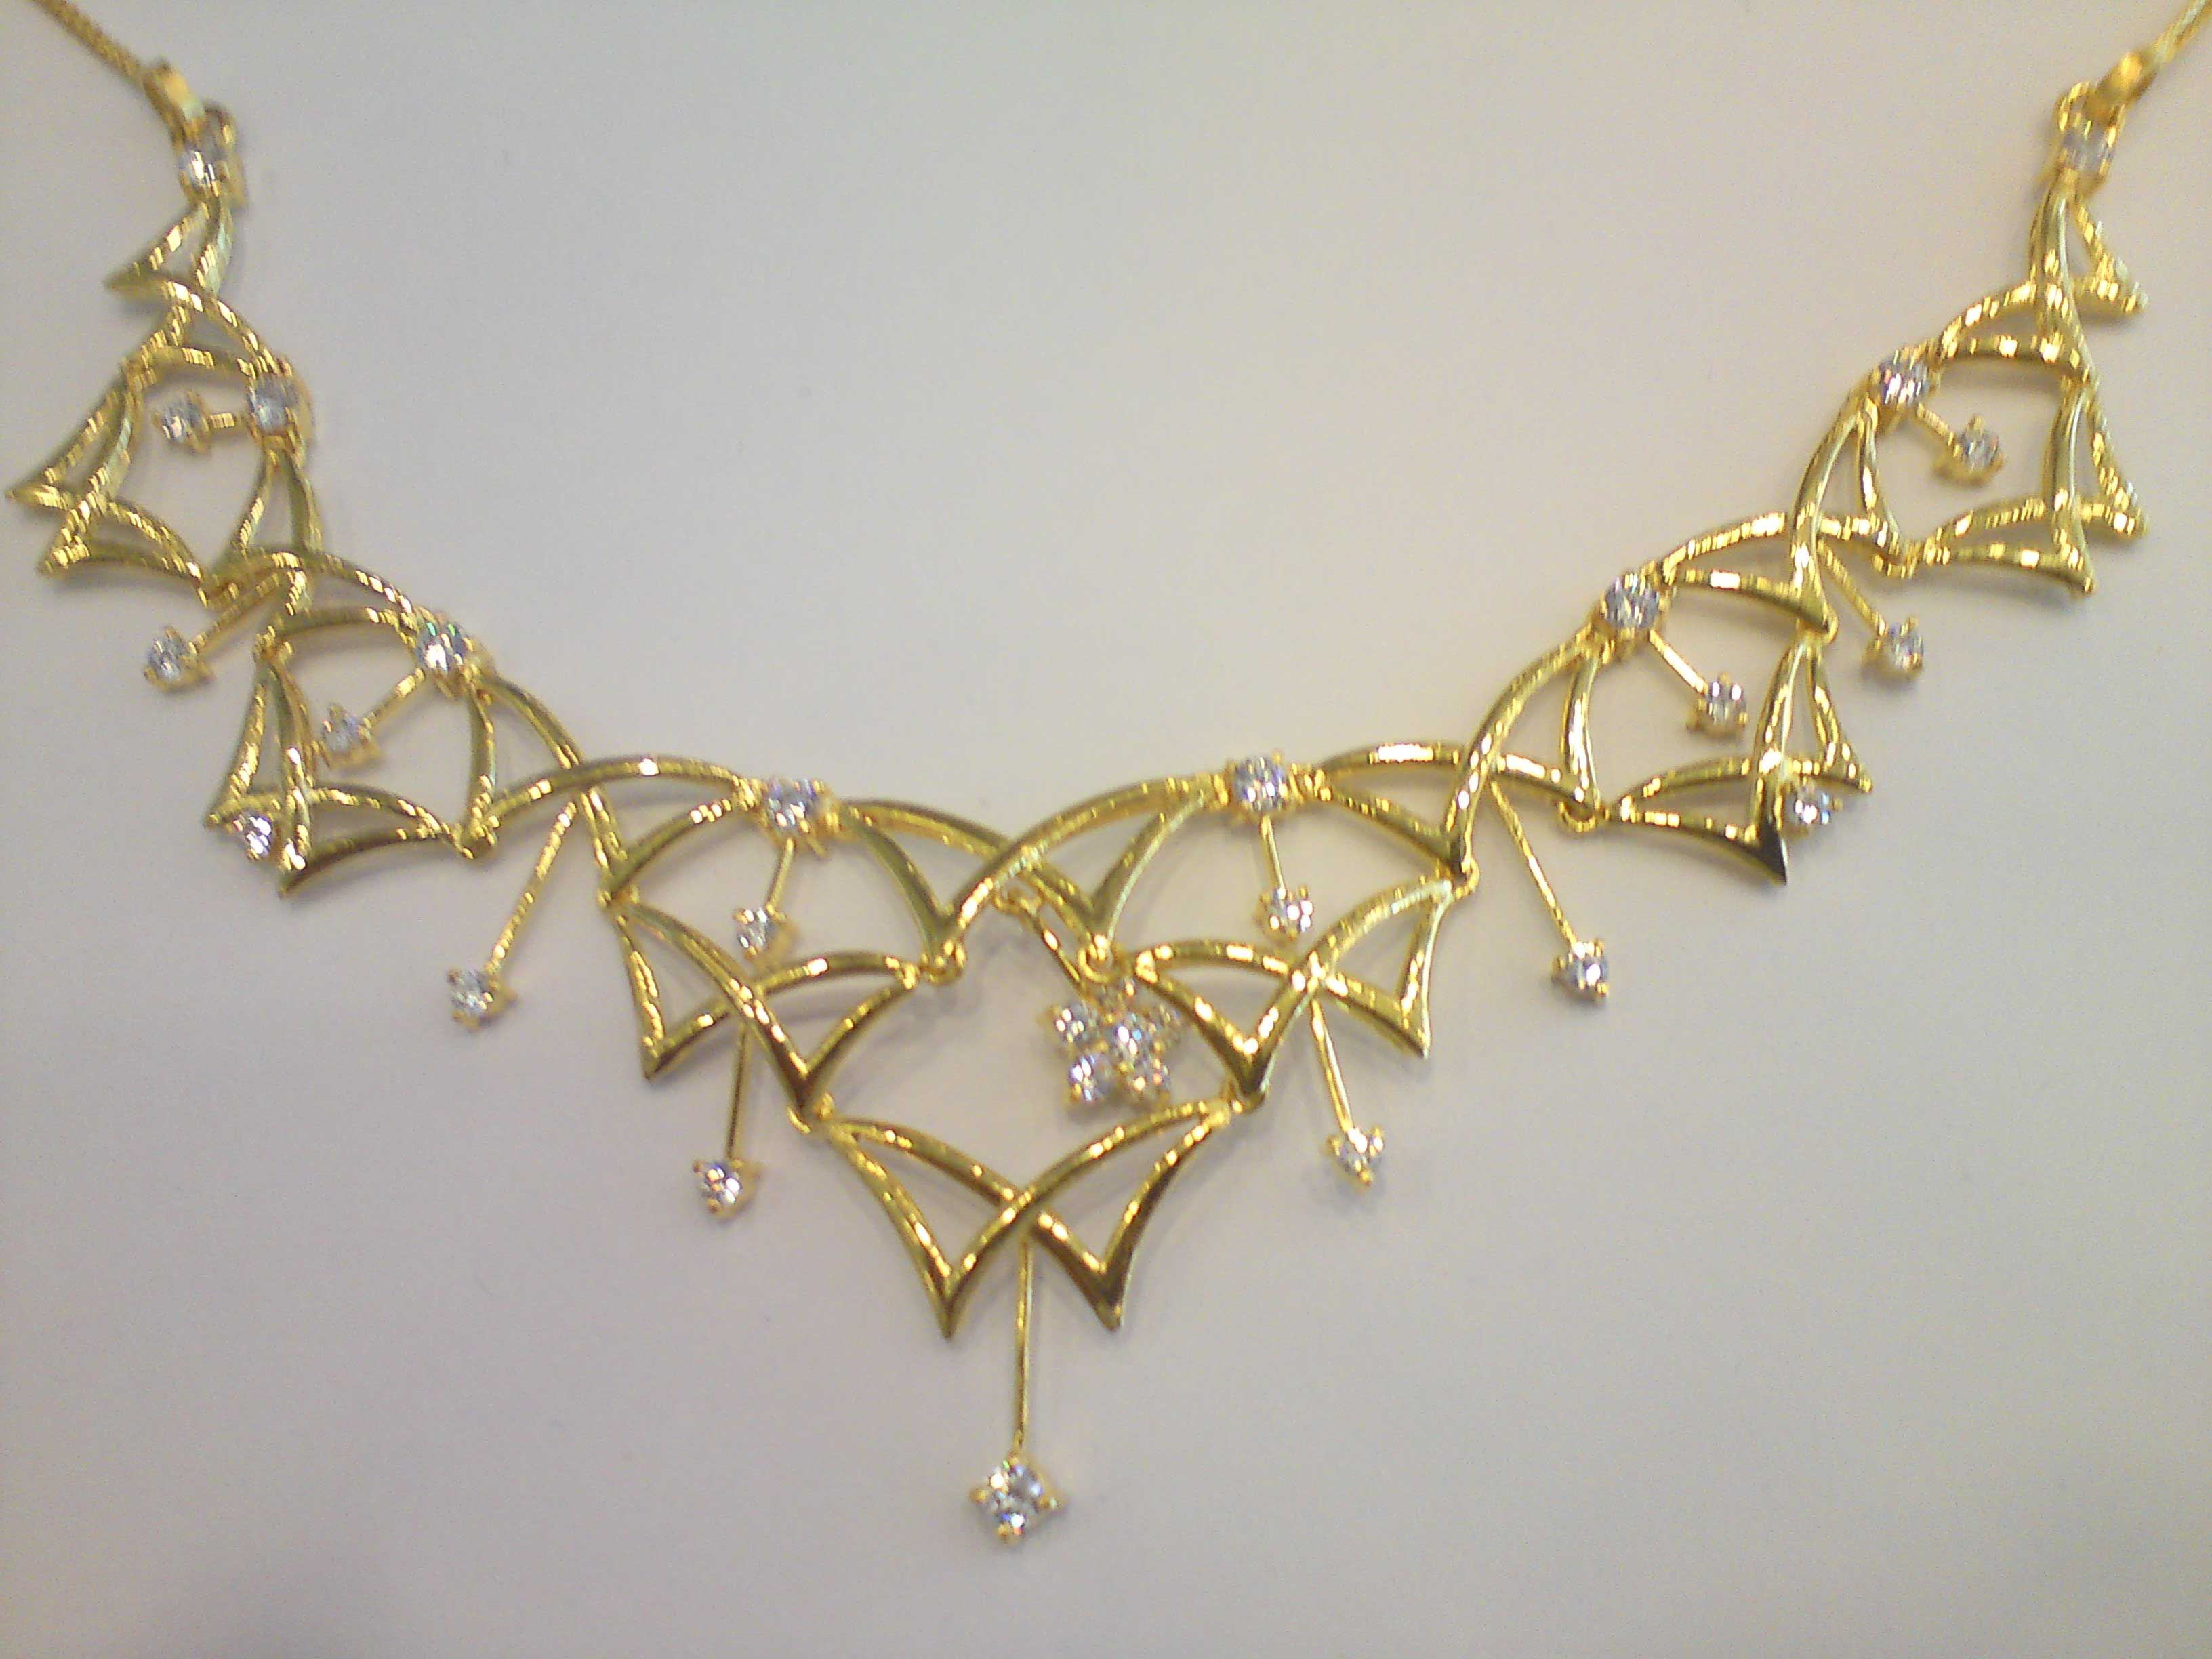 Gold Wedding Necklace Sri Lanka Google Search